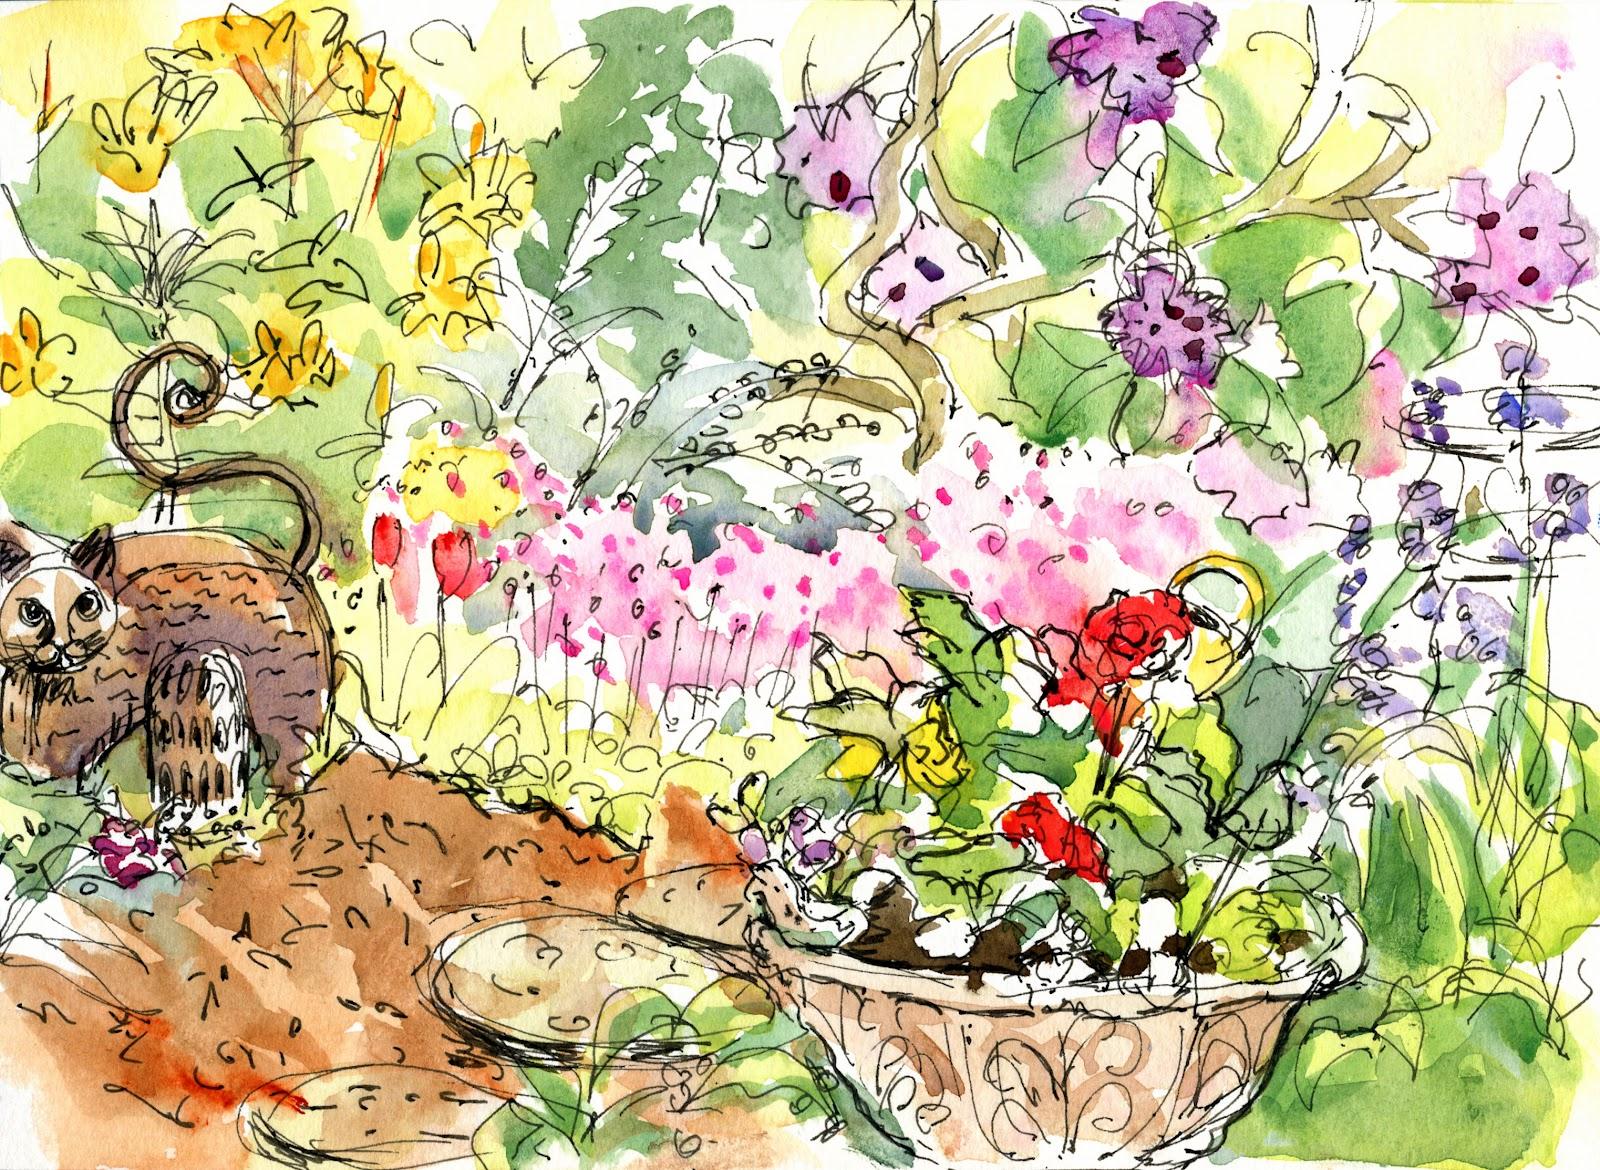 Whidbey Island Sketchers Barbara Marys Lyrical Garden